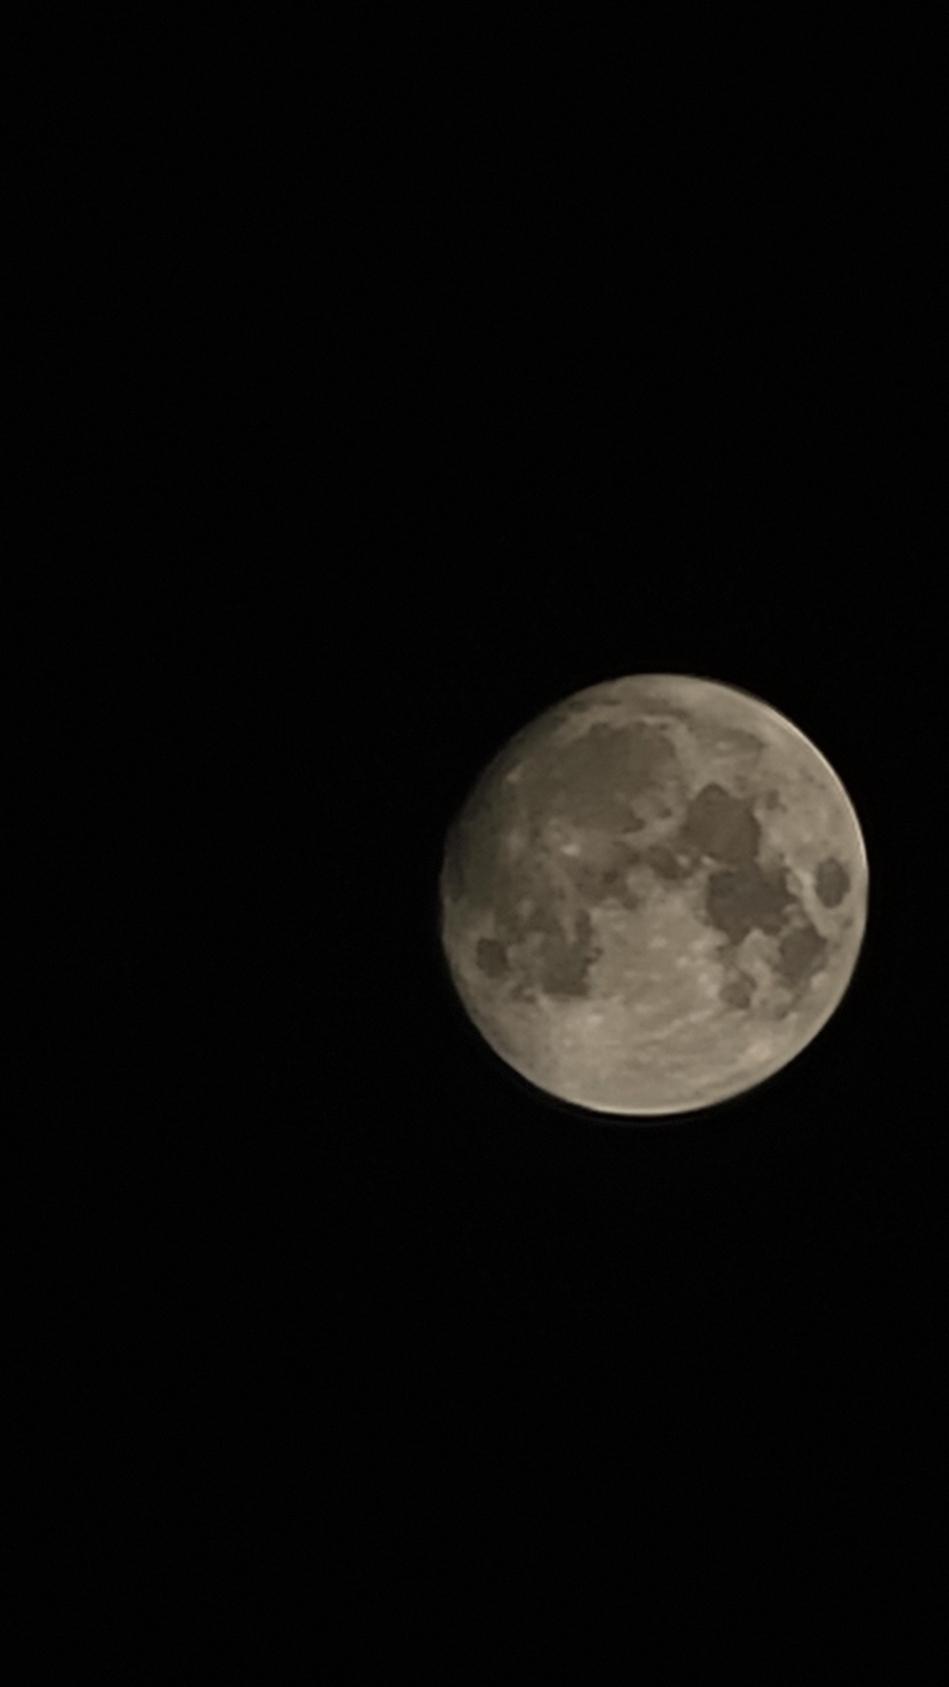 20210723_000044.jpg : 밤 하늘에 보름달이 떳네요